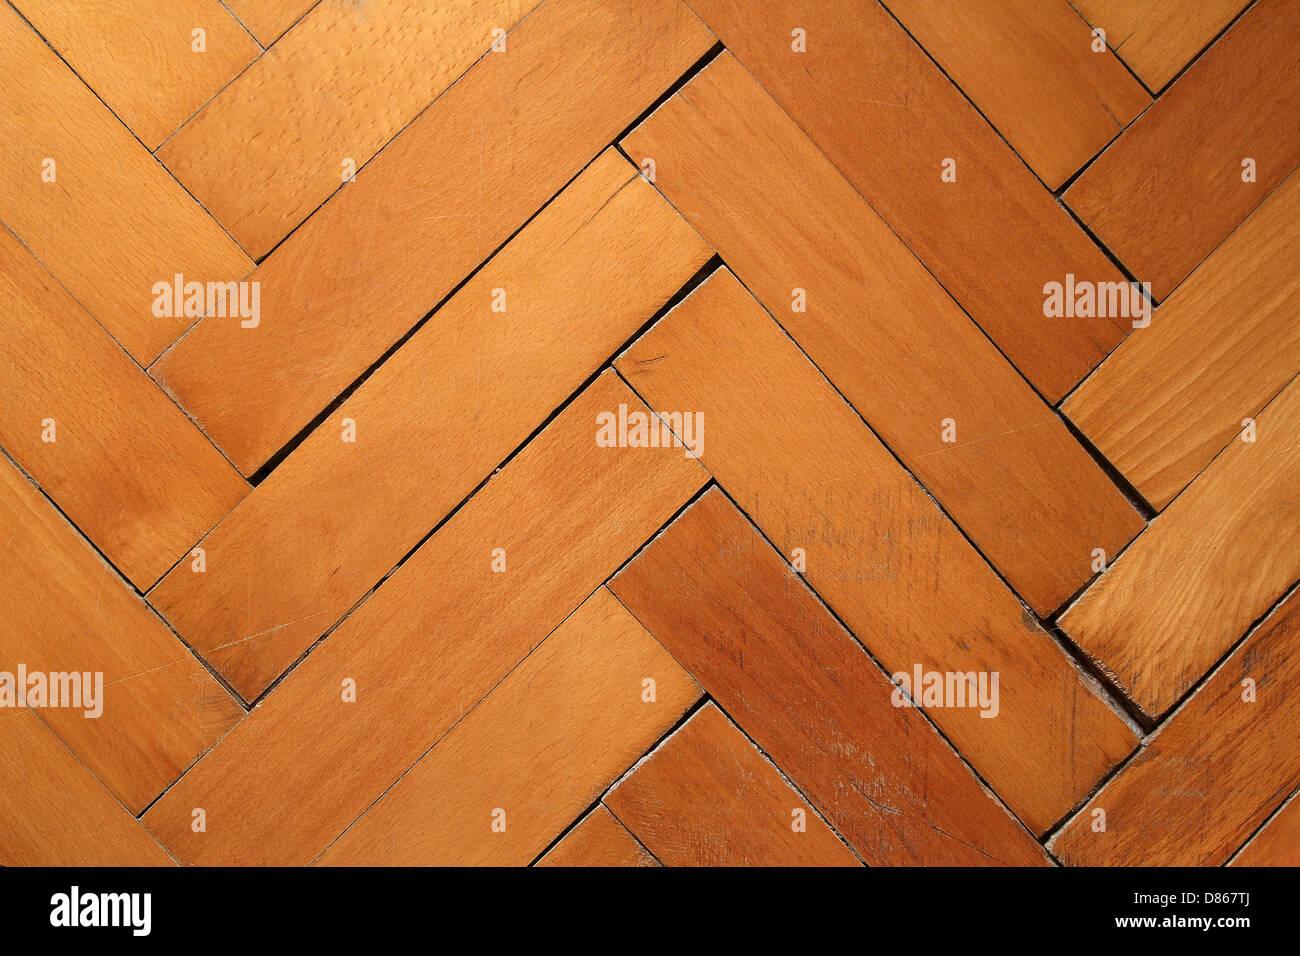 parquet floor background - Stock Image